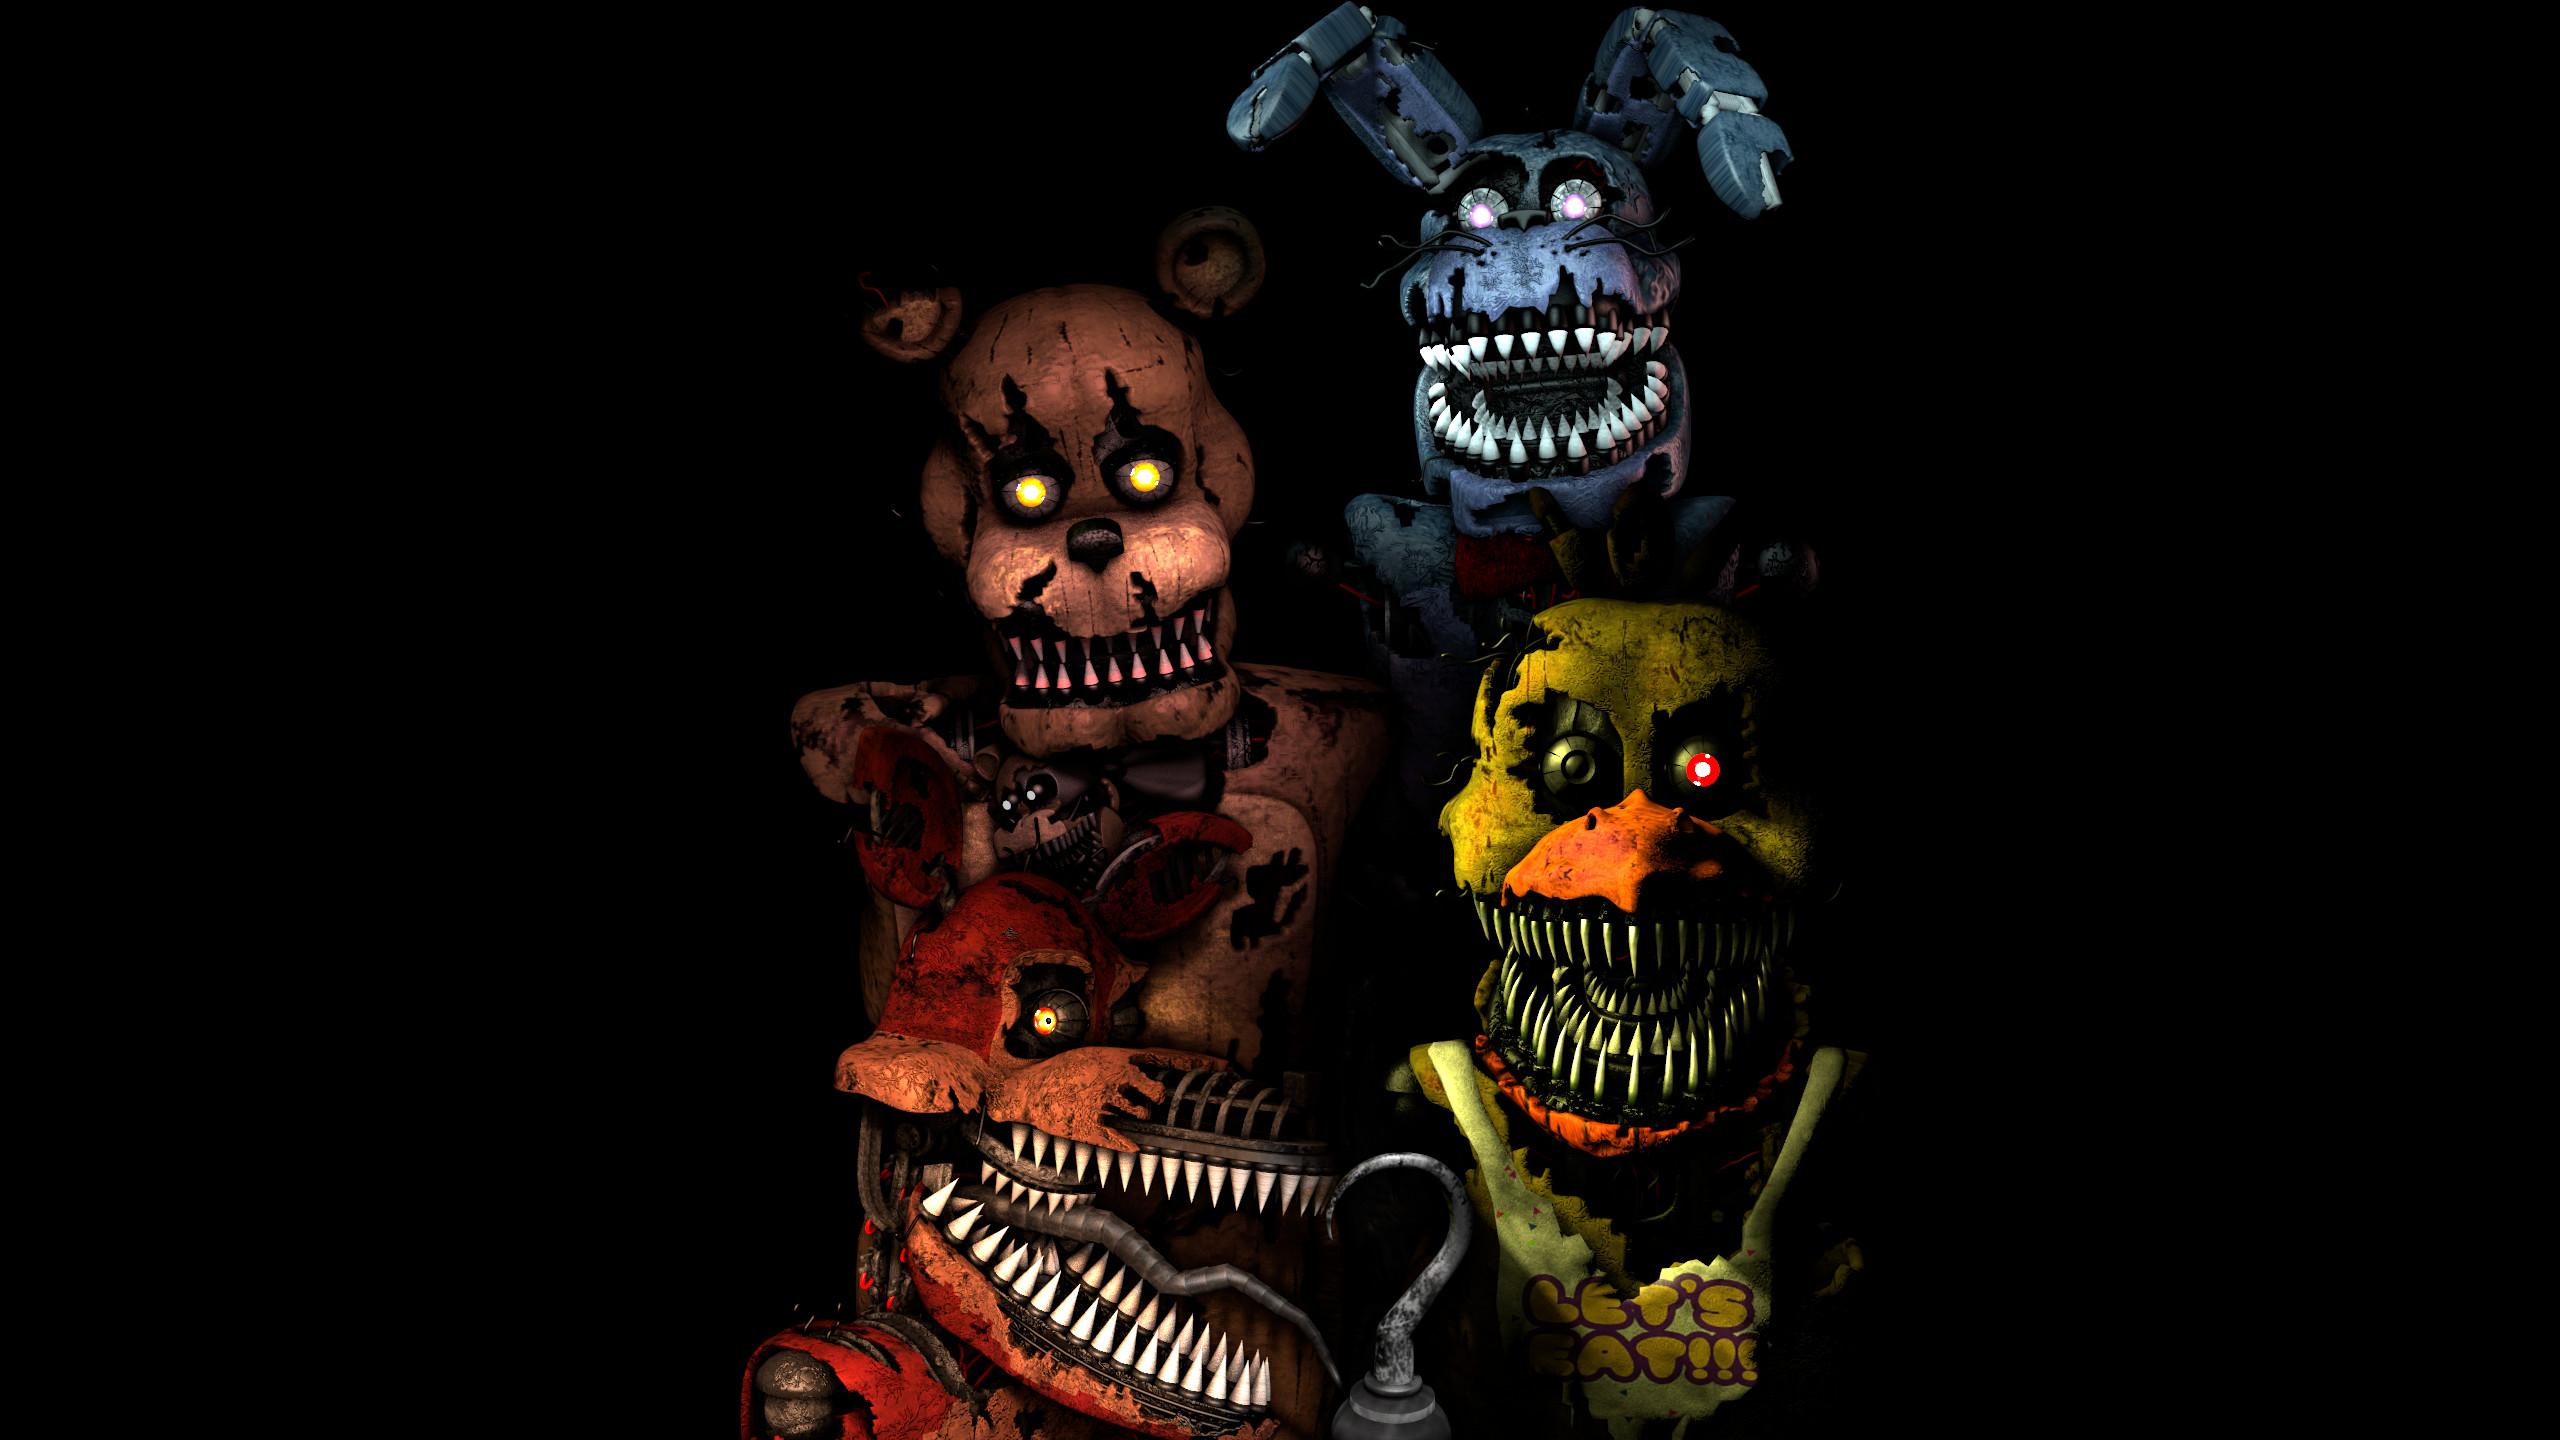 … FNaF] Five Nights at Freddy's 4 Wallpaper by Endymush